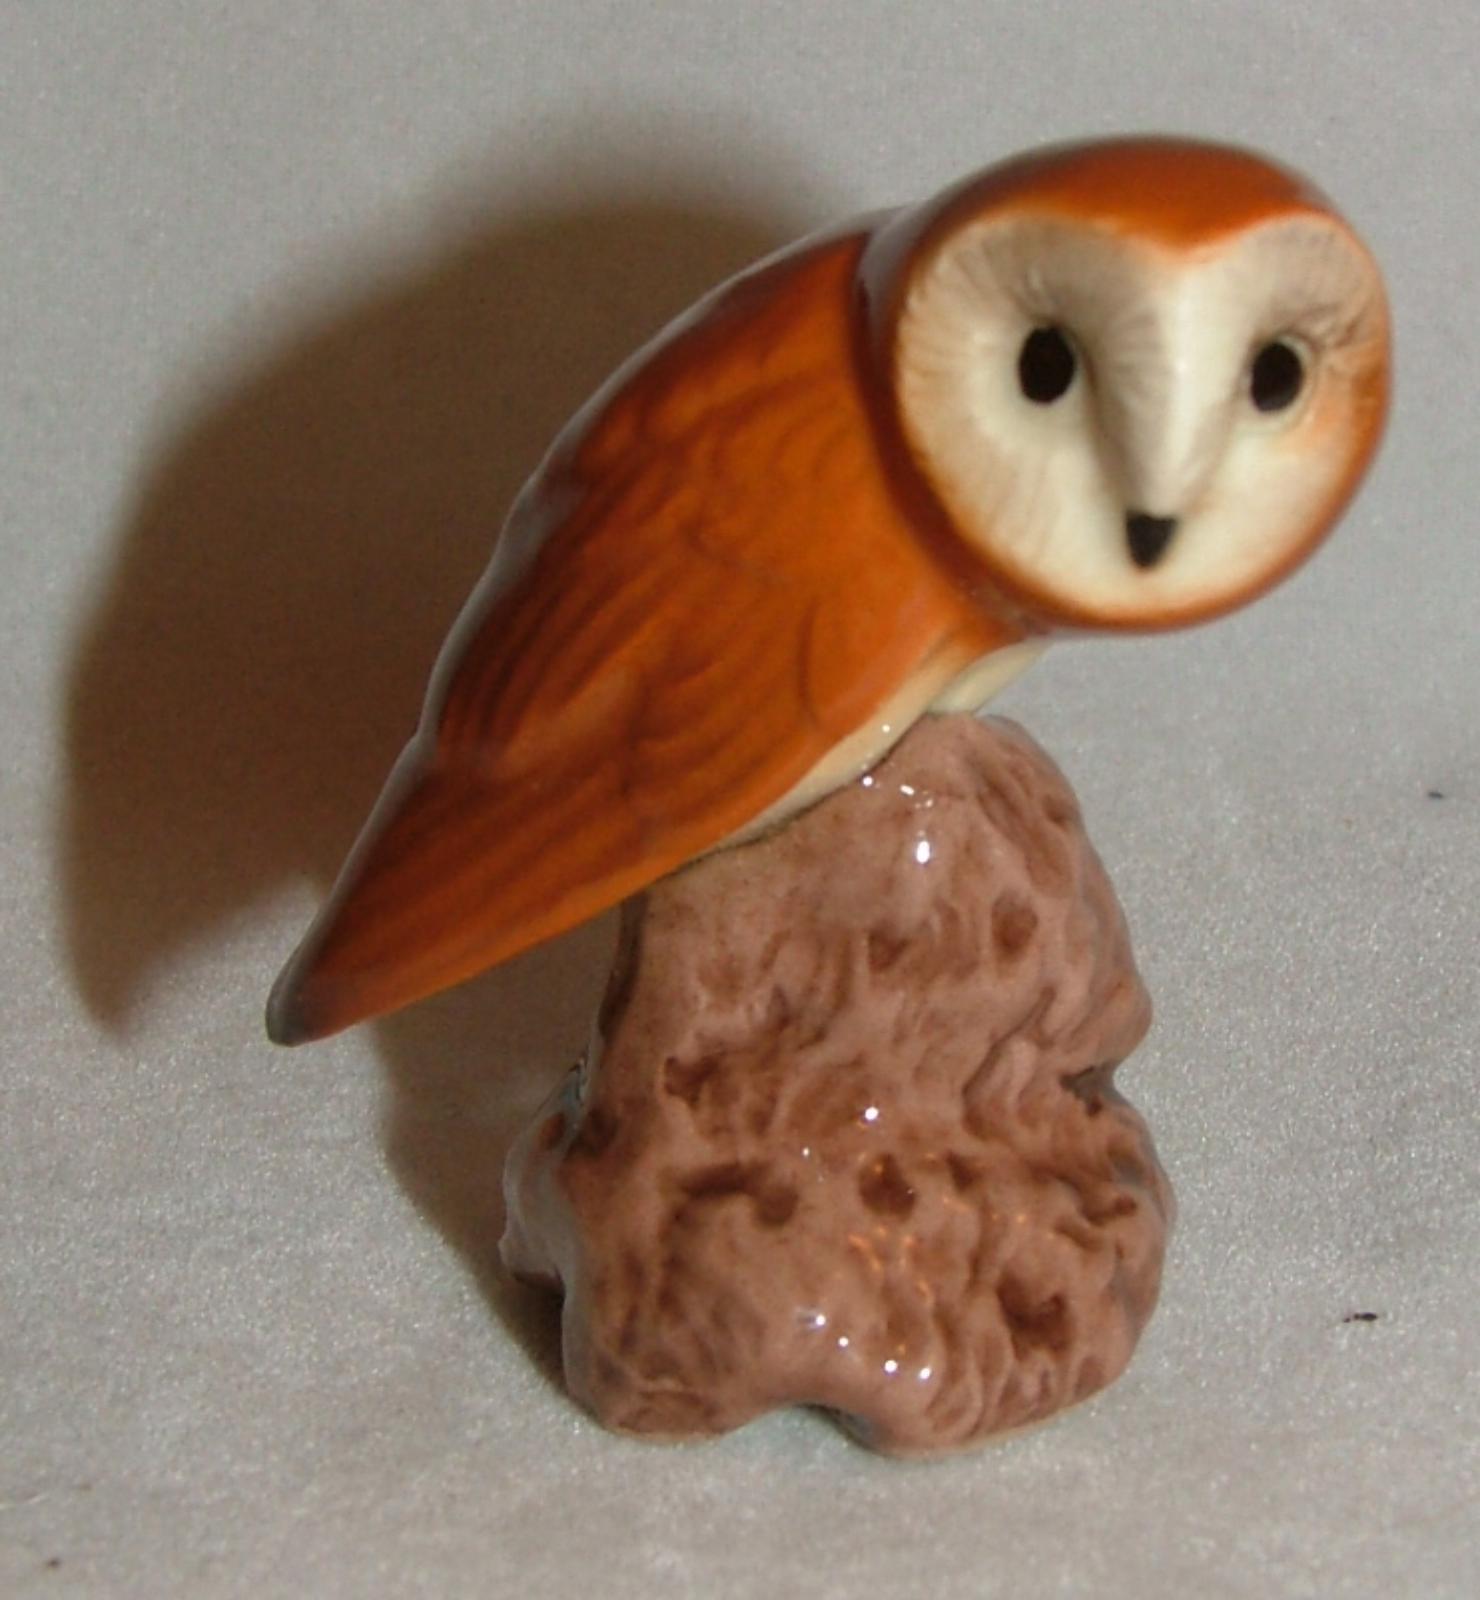 Barn Owl Miniature Ceramic Figurine Bird Model USA Made by Hagen-Renaker